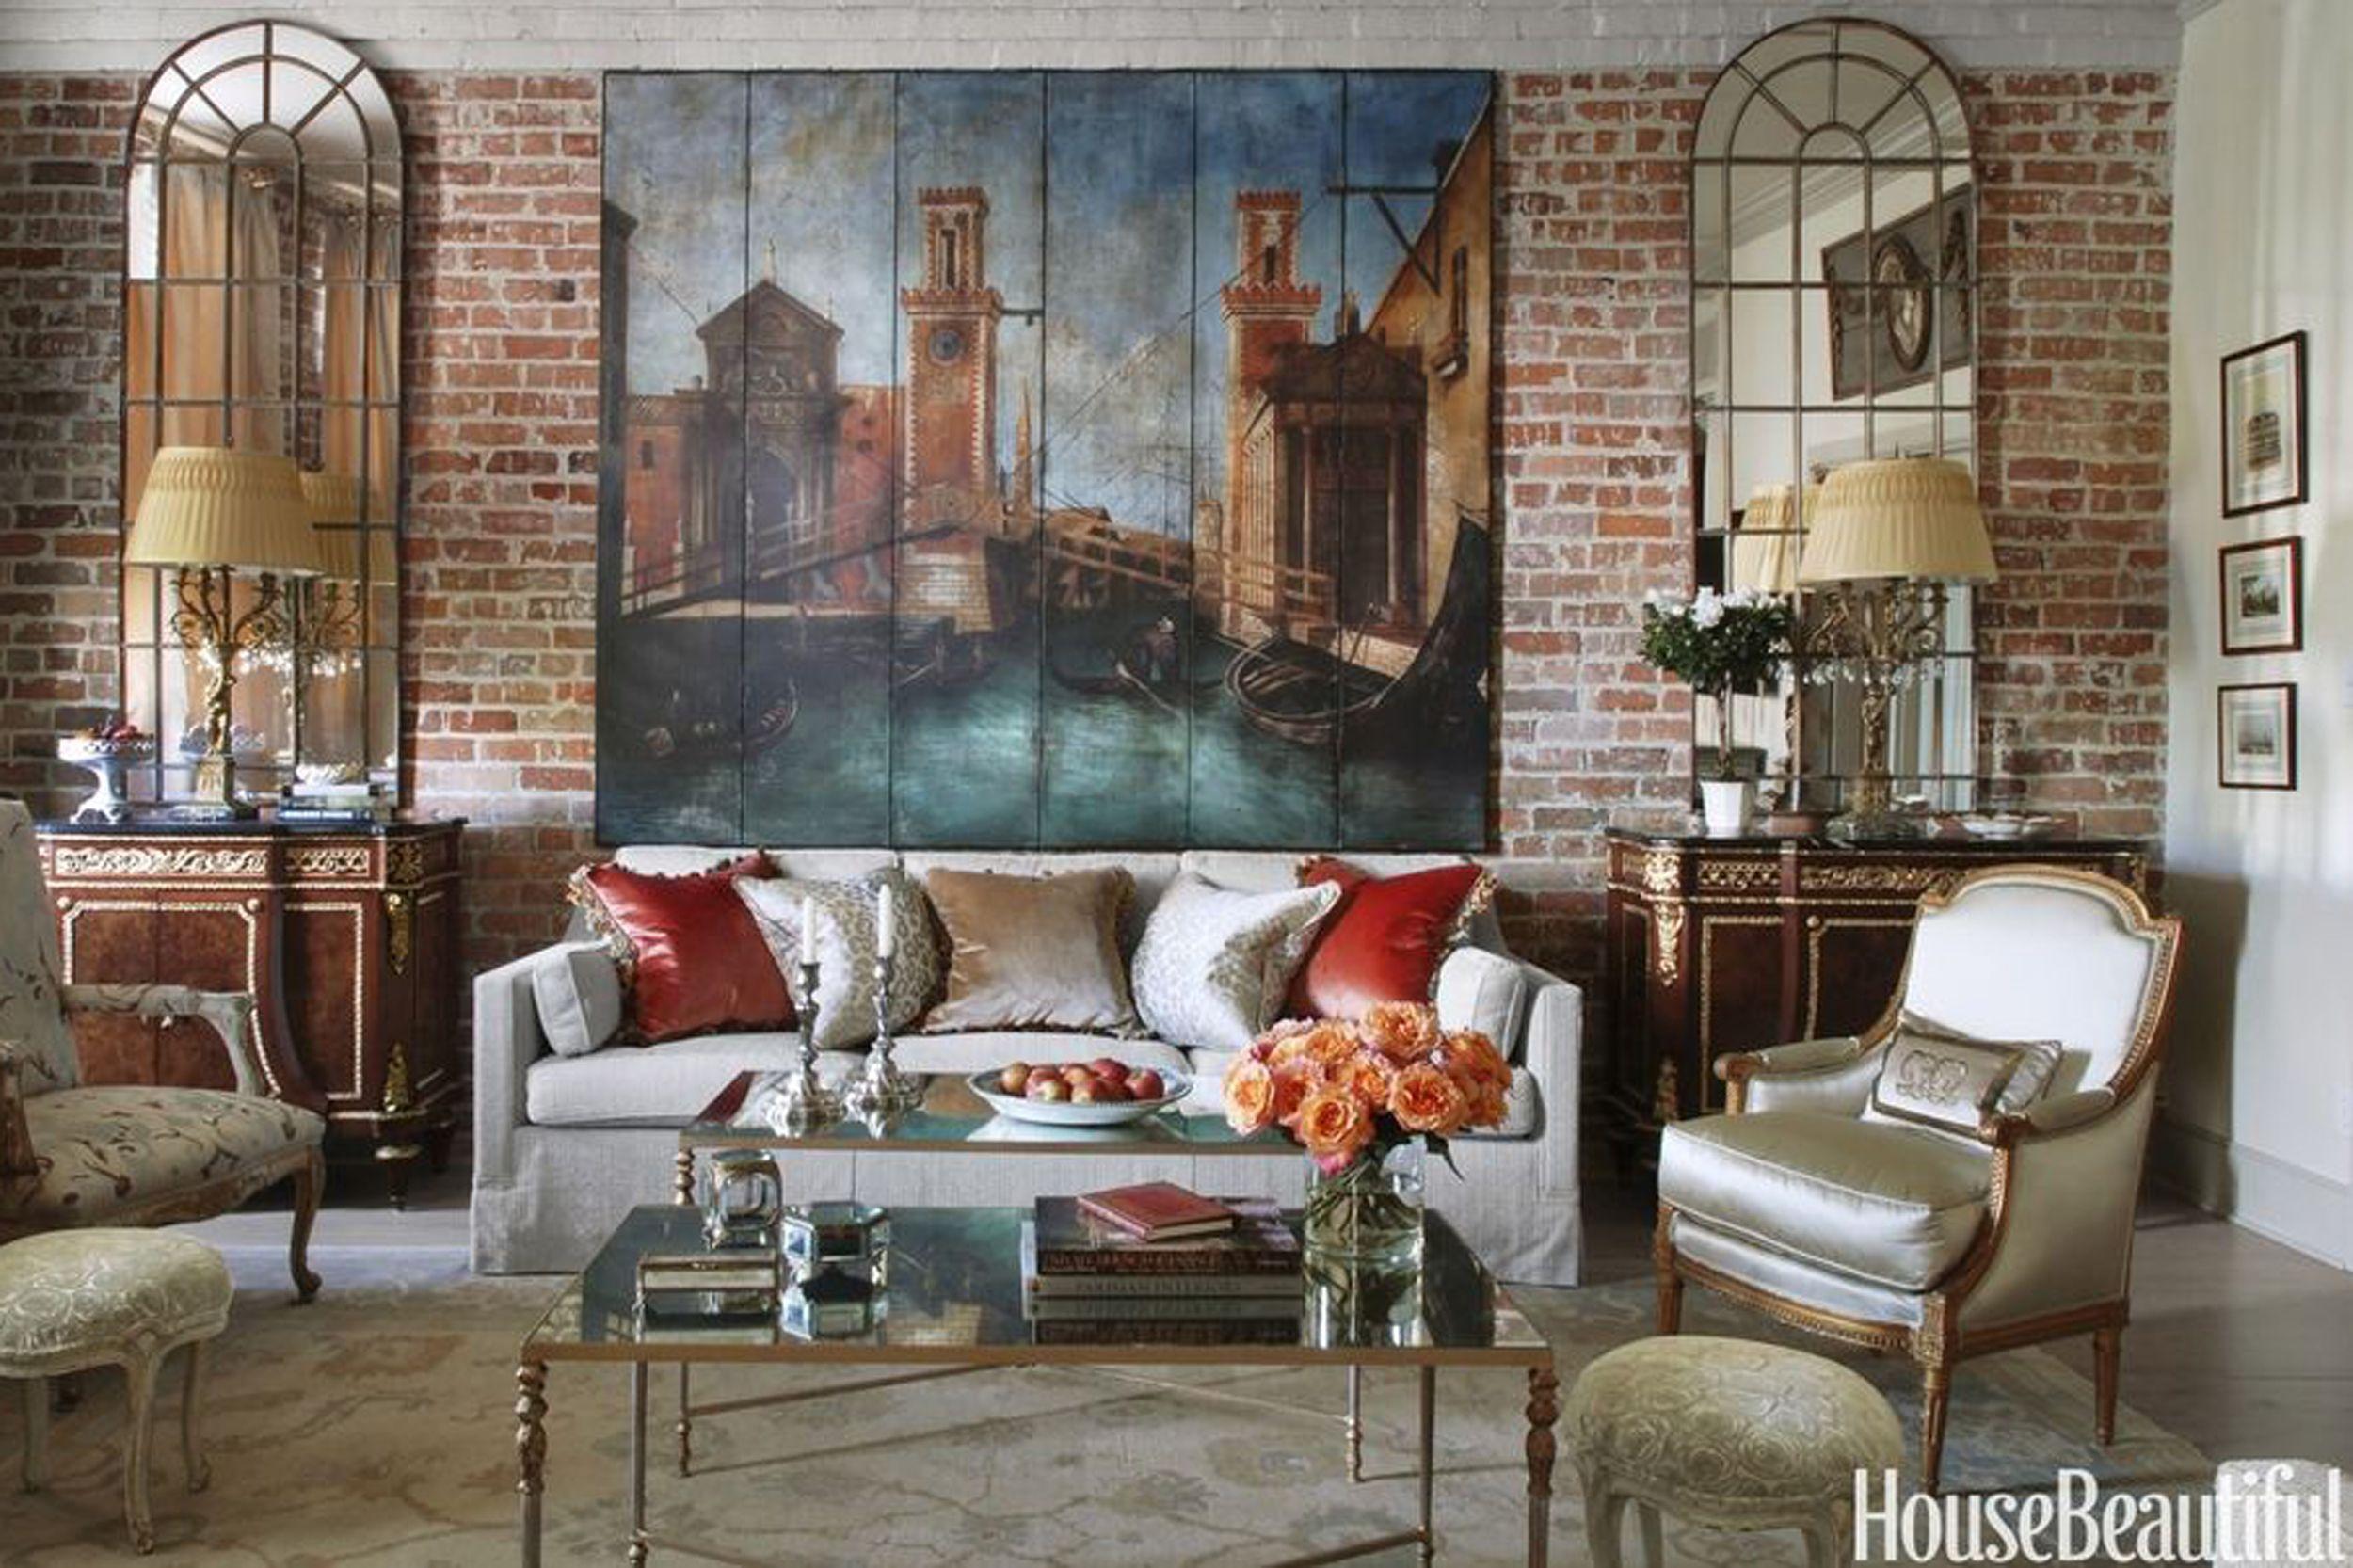 18 Rustic Room Decorating Ideas - Cozy Rooms